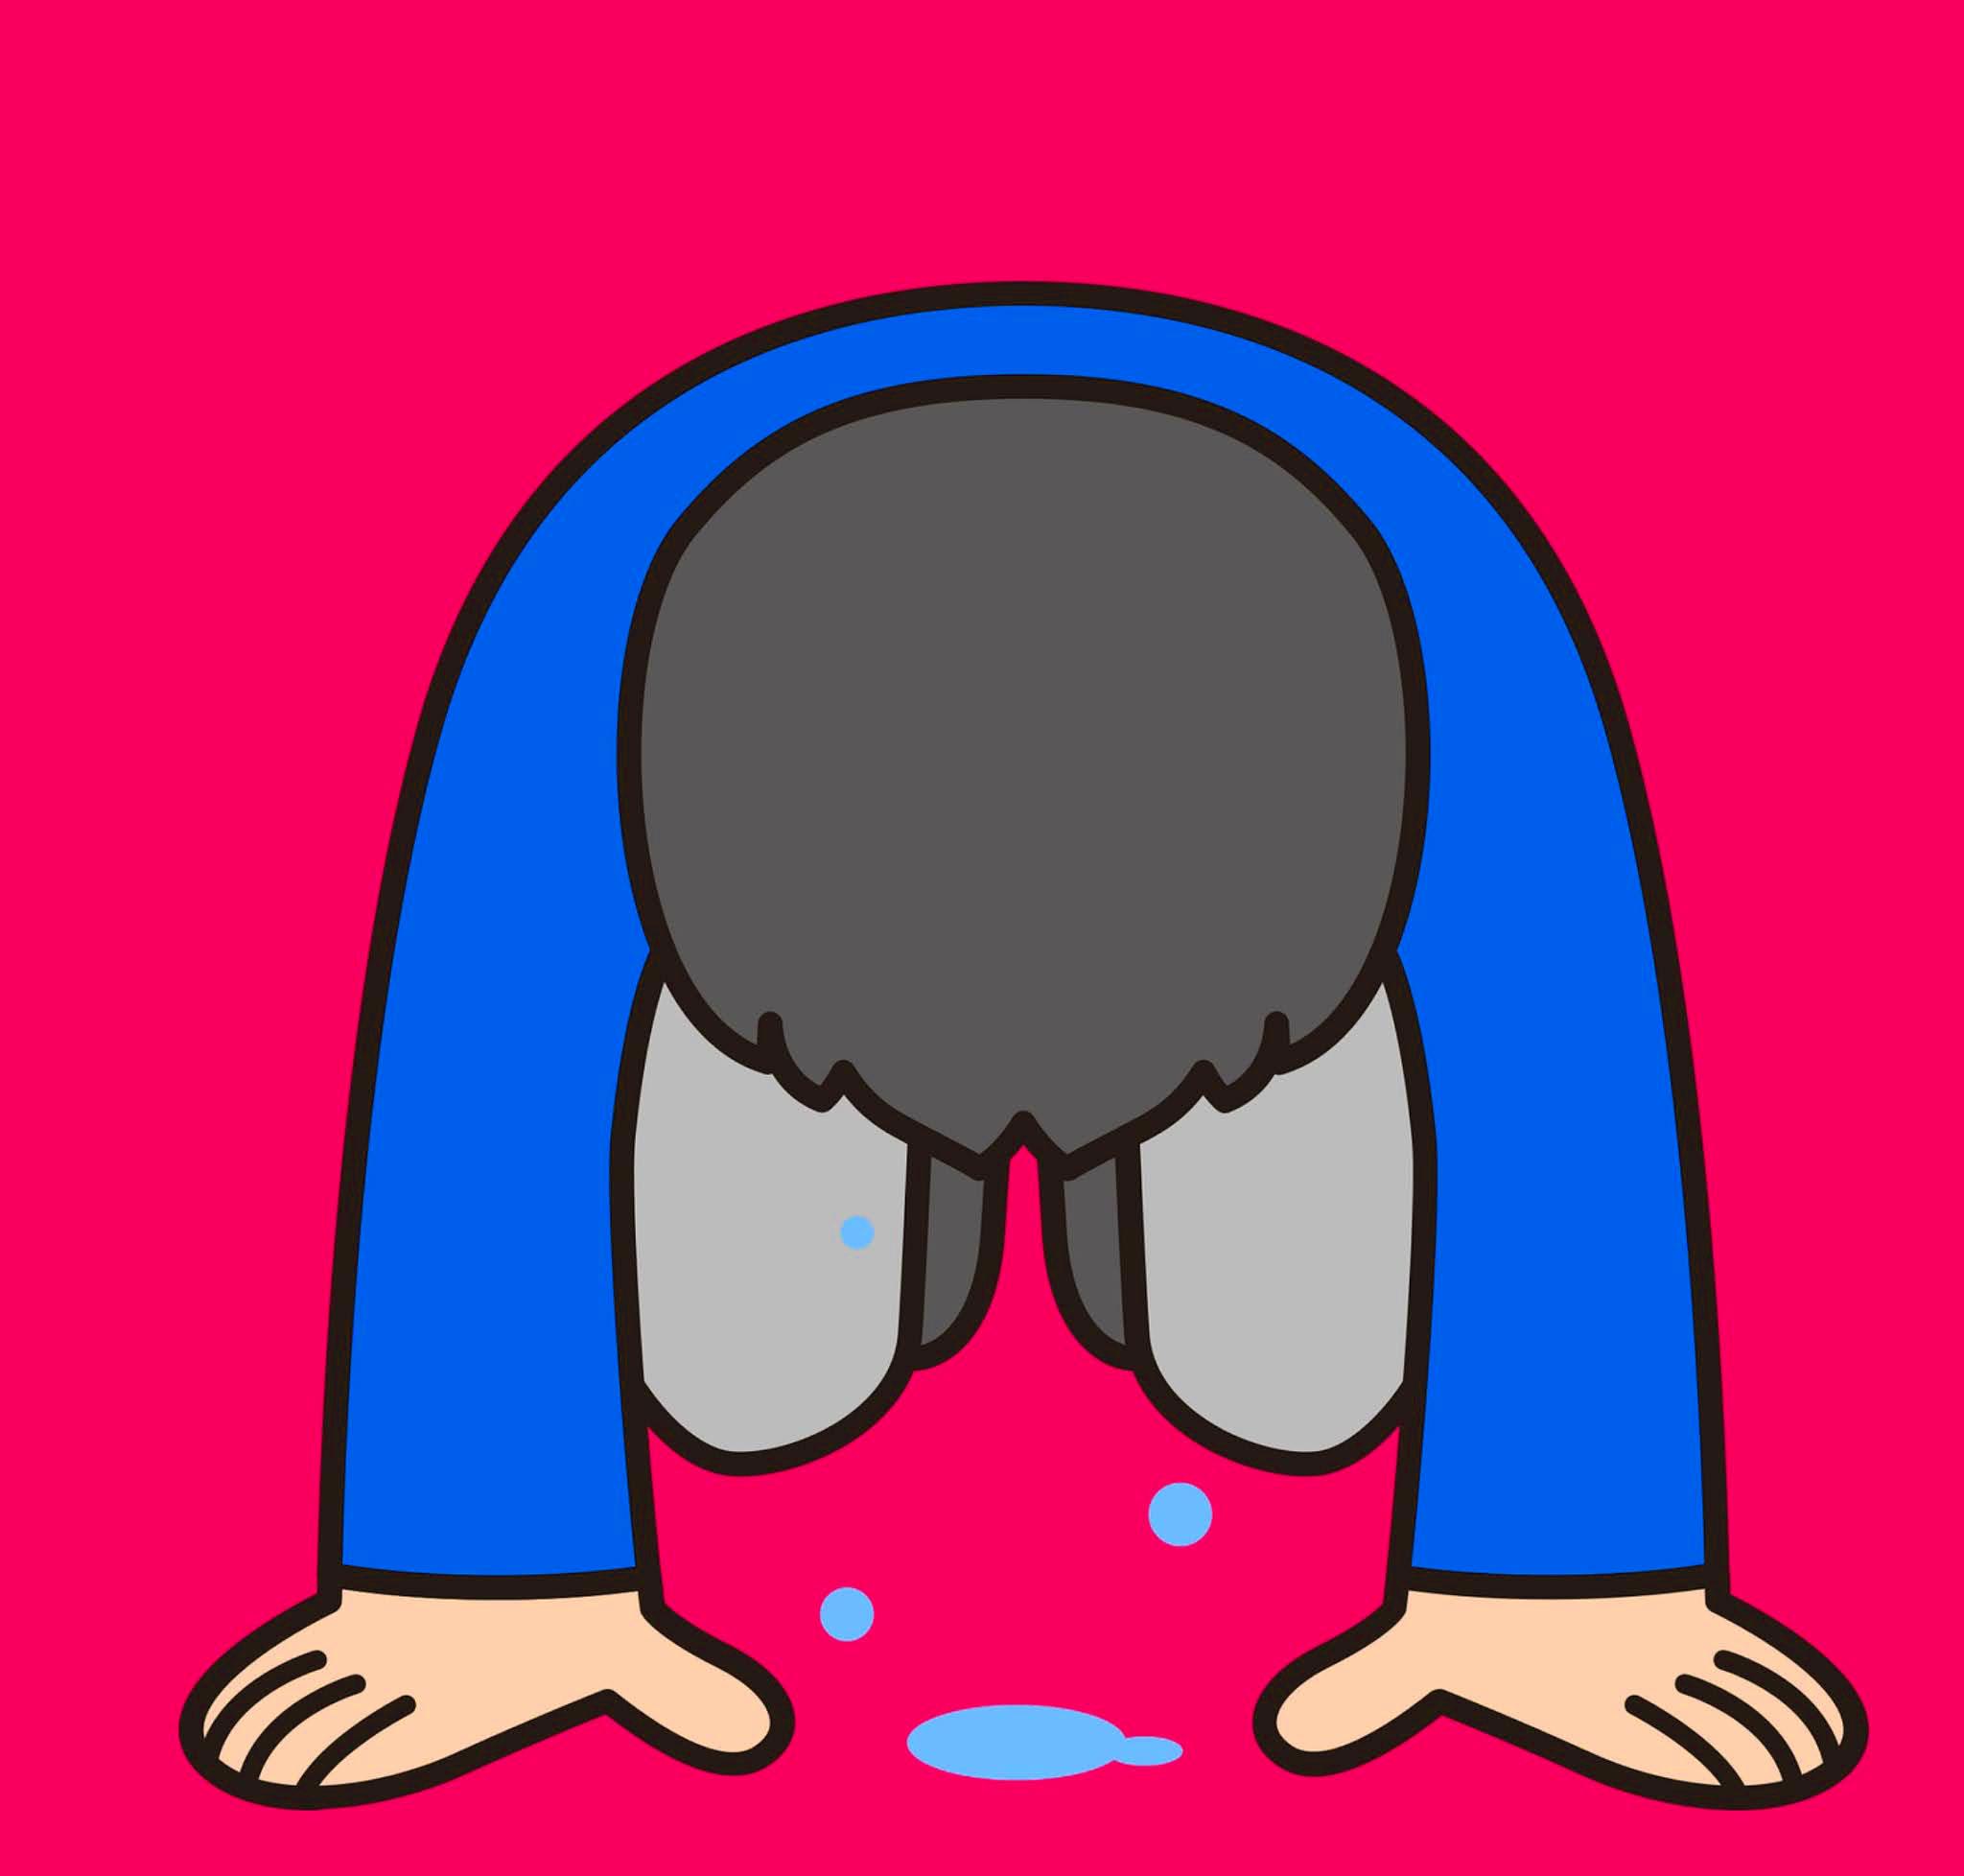 yoga Latest Sad Cartoon Dp Images hd